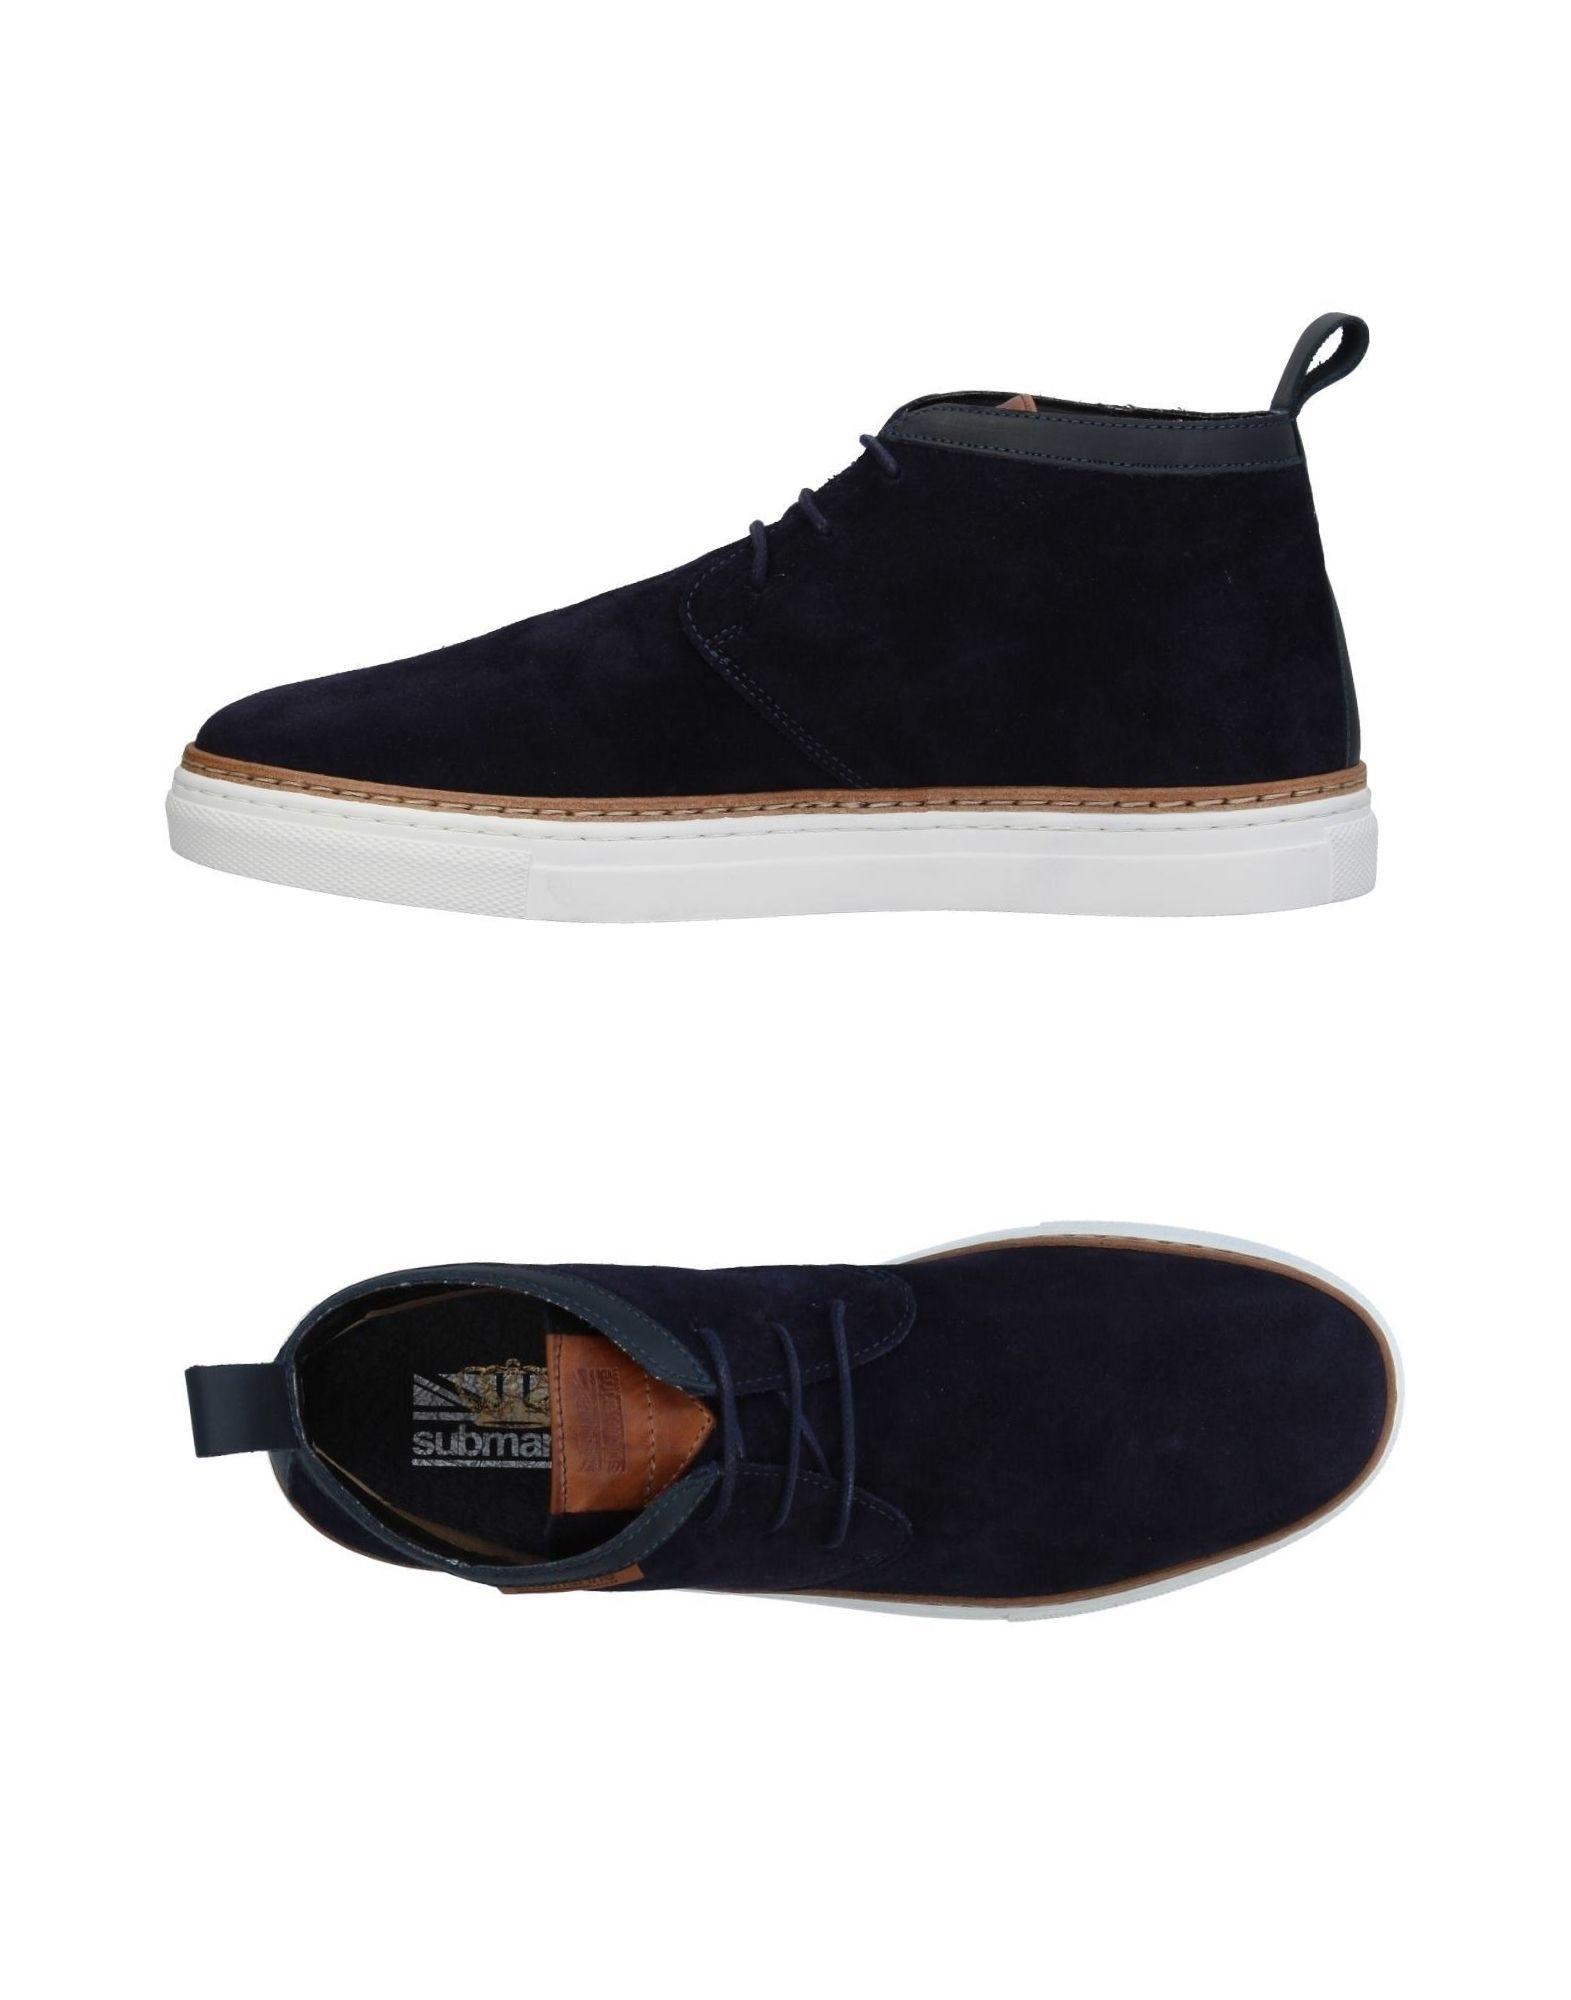 SUBMARINE Высокие кеды и кроссовки кеды кроссовки высокие dc council mid tx stone camo